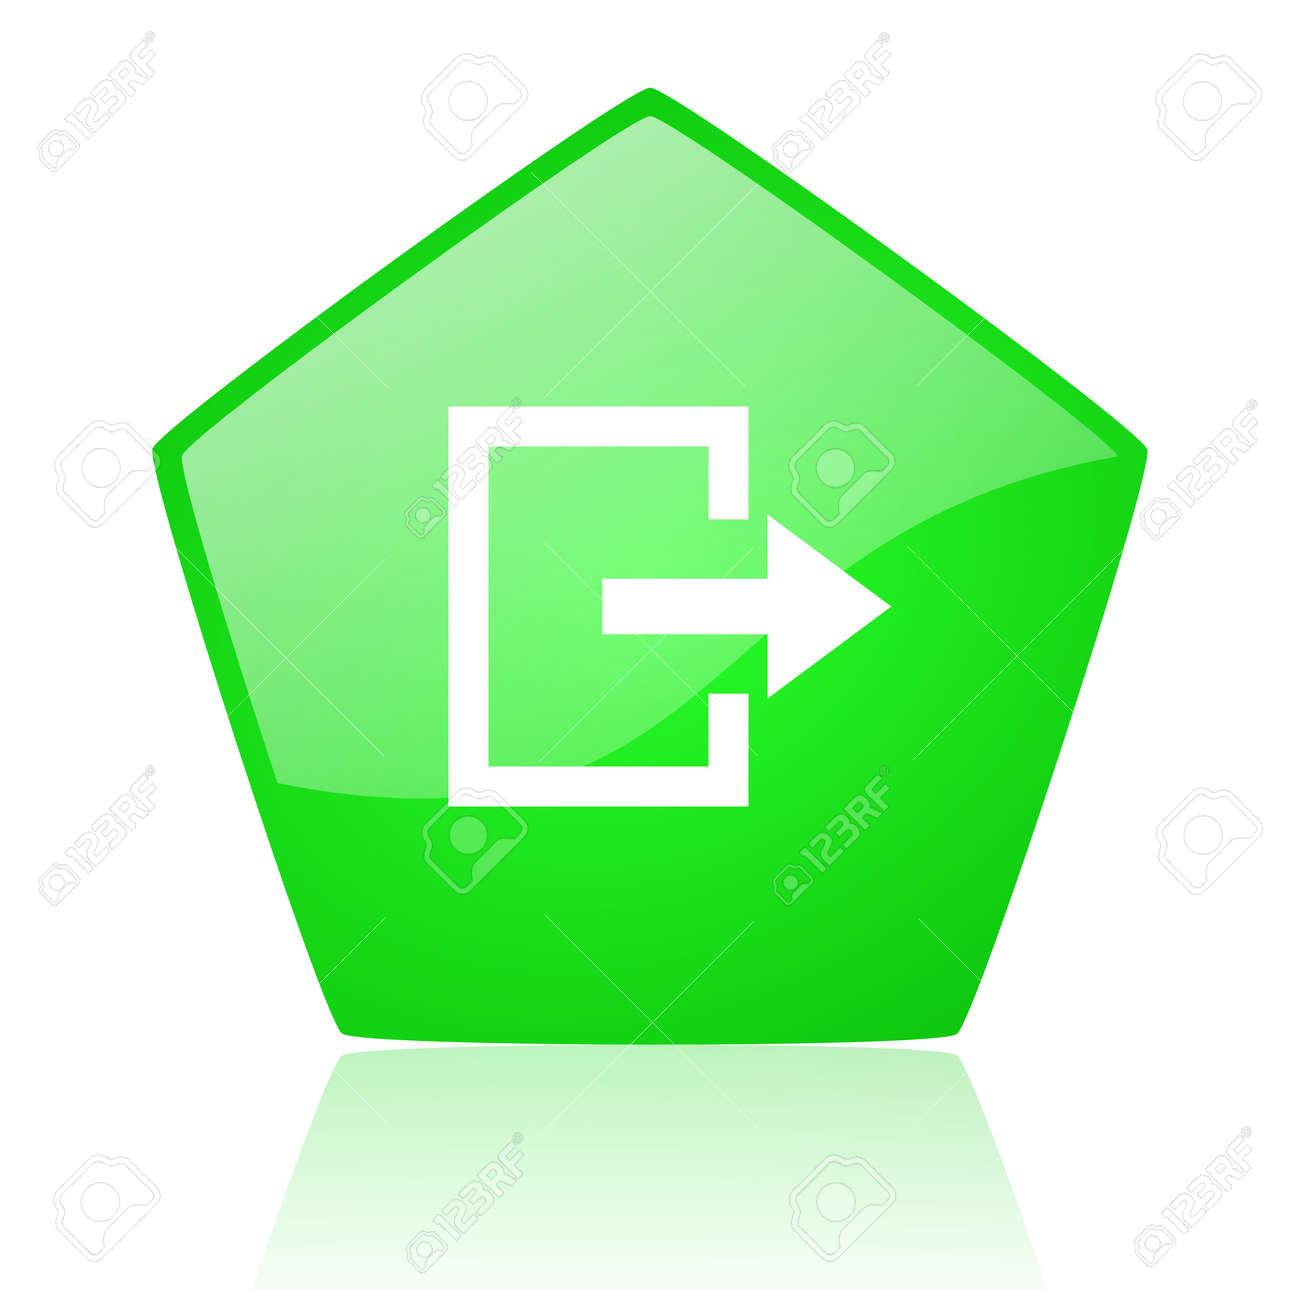 exit green pentagon web glossy icon Stock Photo - 19227673